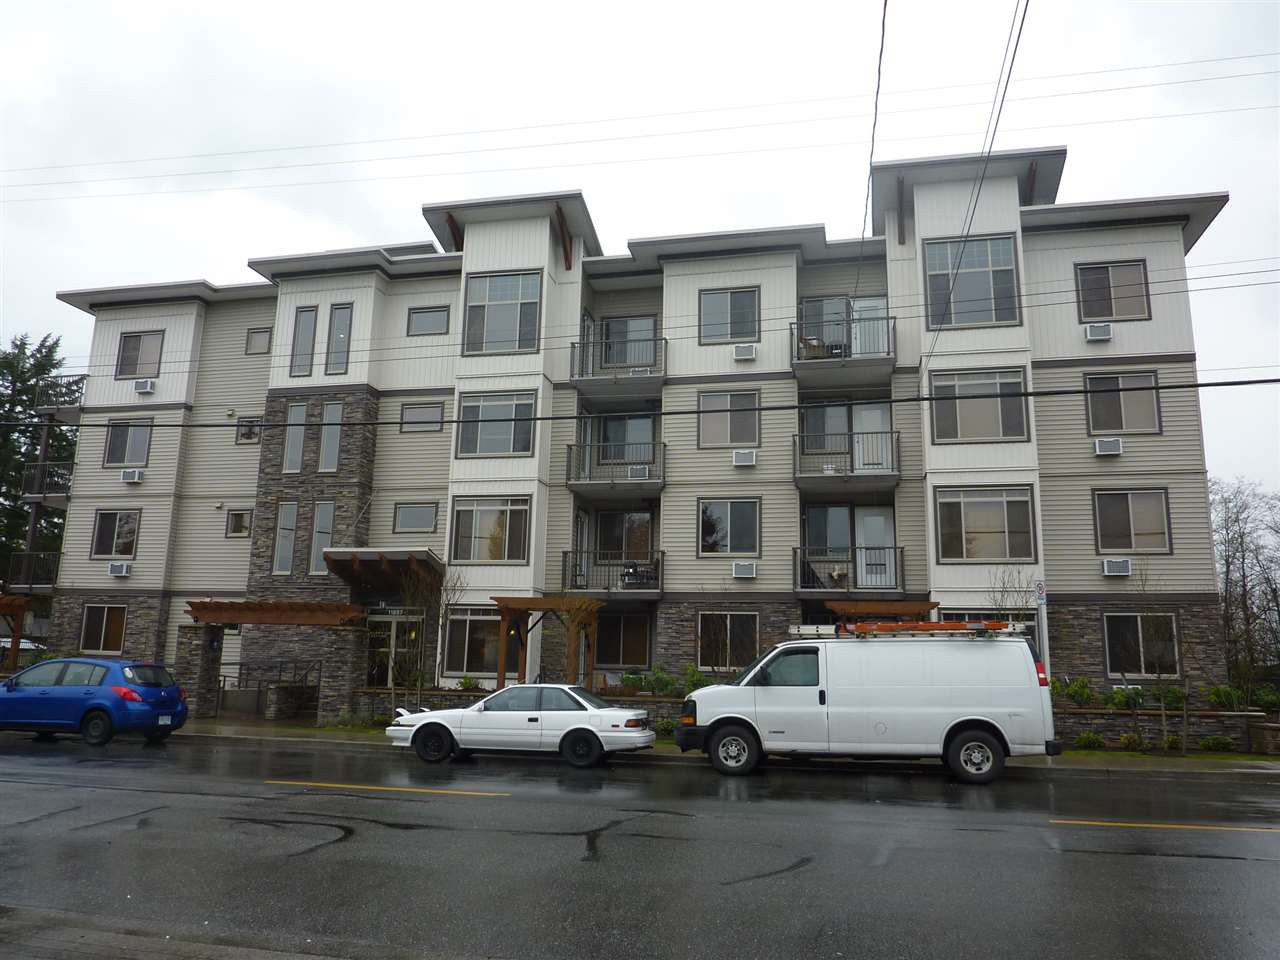 "Main Photo: 217 11887 BURNETT Street in Maple Ridge: East Central Condo for sale in ""WELLINGTON STATION"" : MLS®# R2125970"